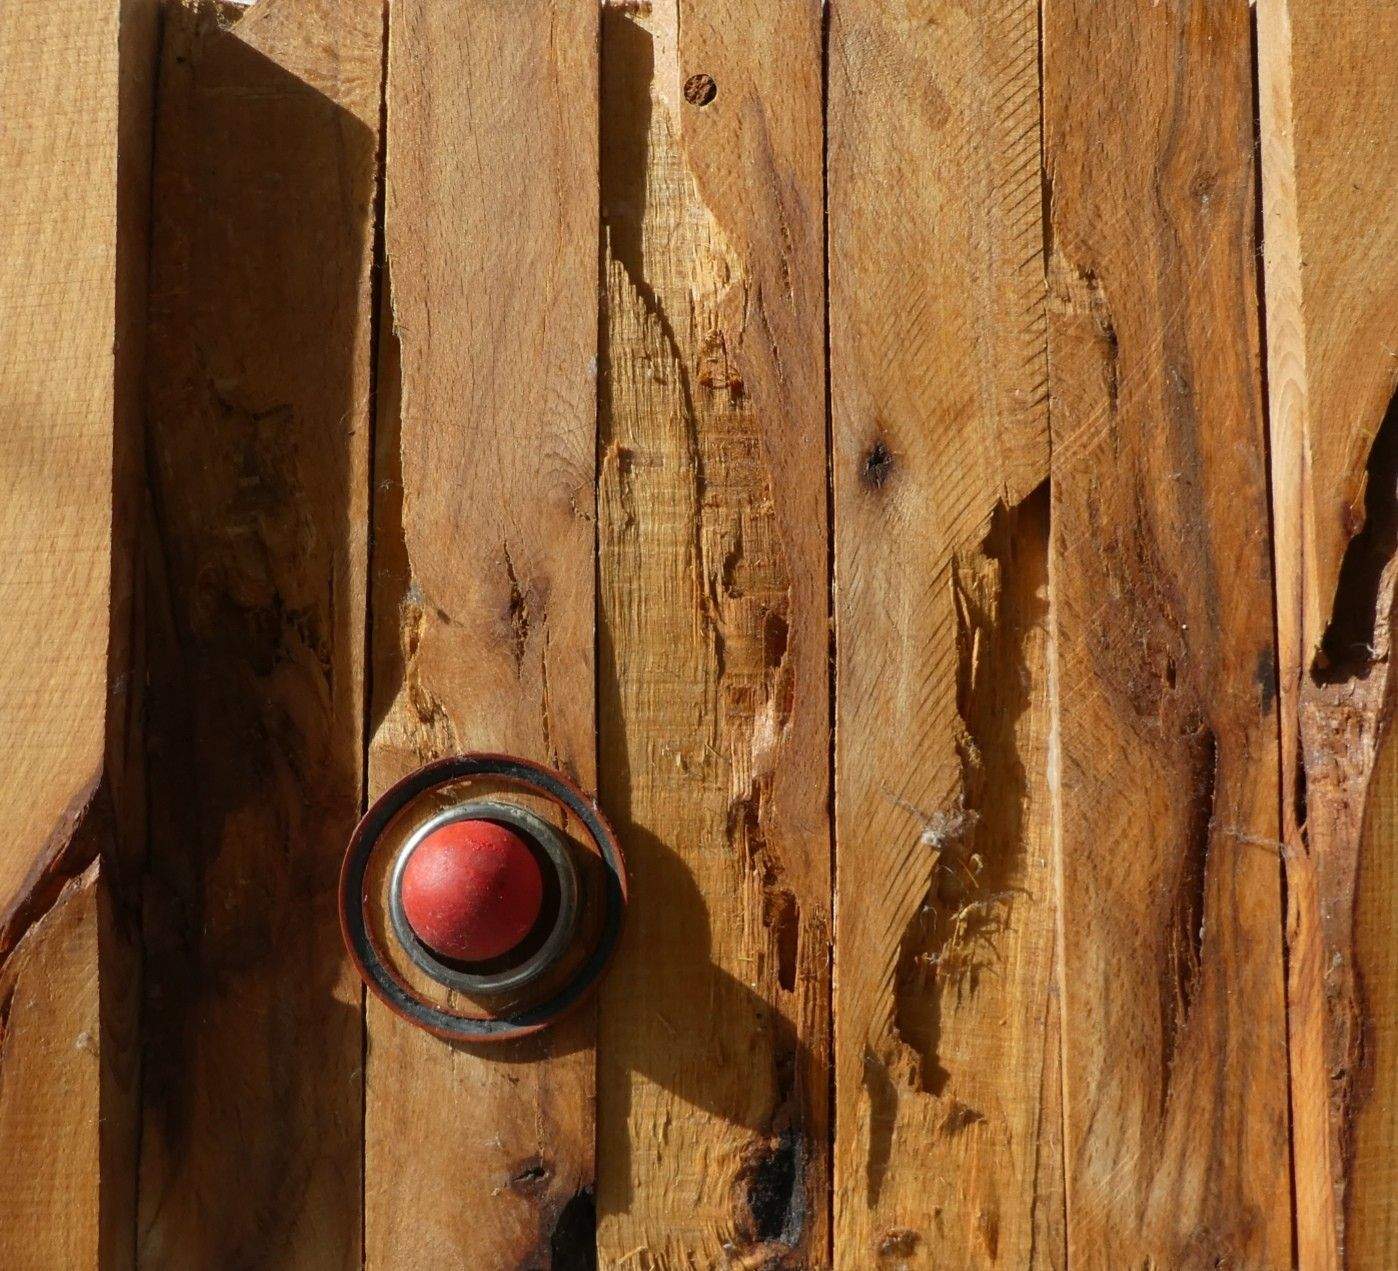 Pin Von Art B U Y Urs Auf Art B U Y Urs Holzwerke Kunstwerke Abstrakte Kunst Handwerker